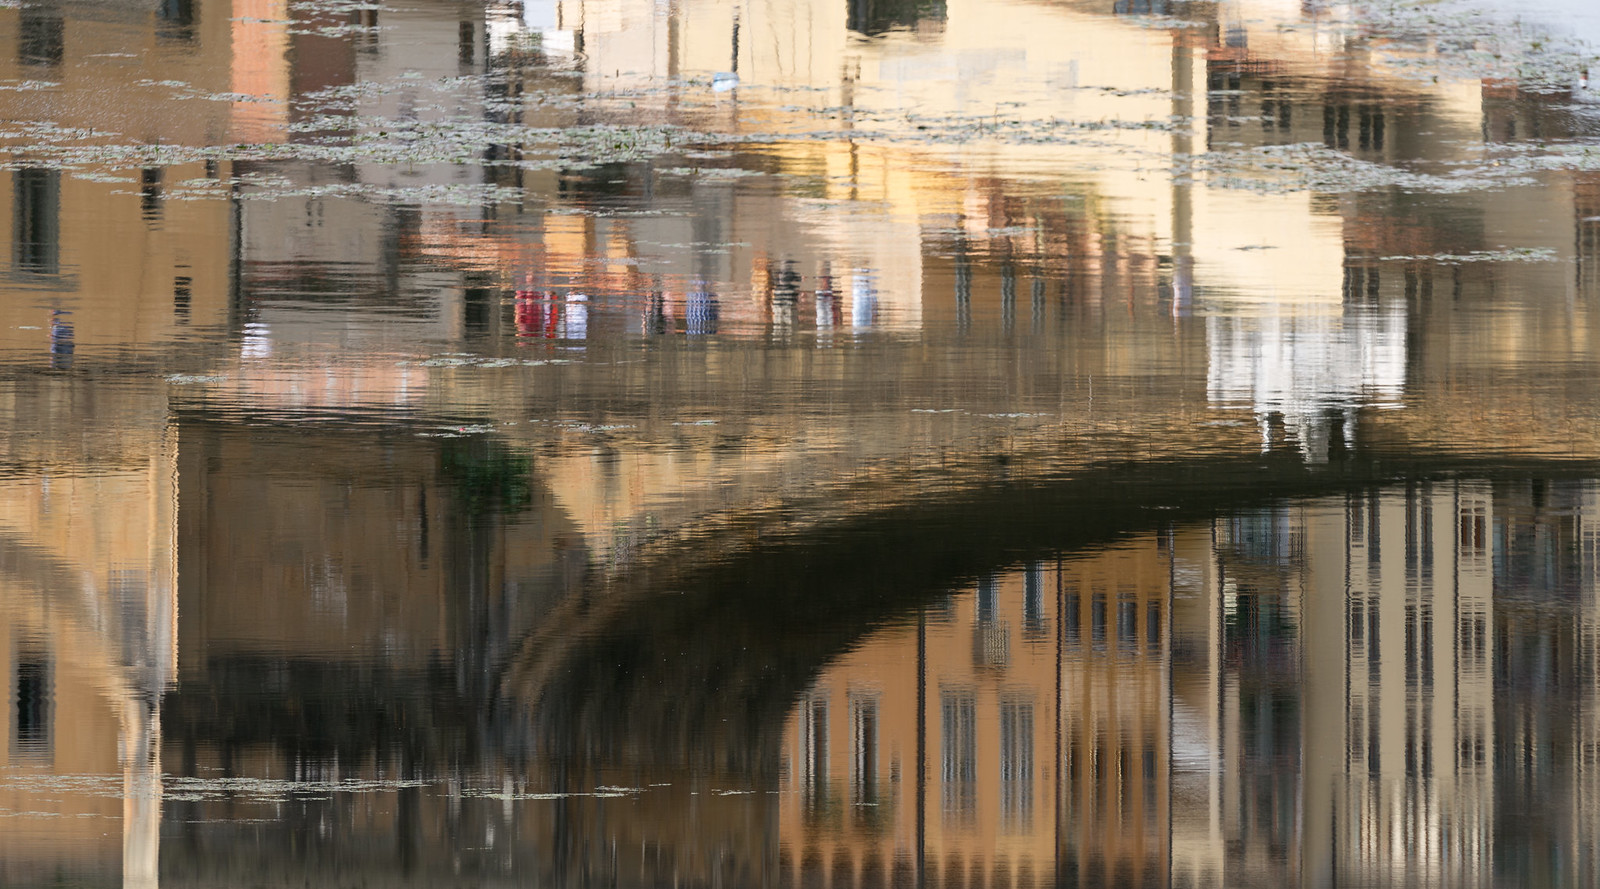 Arno Reflections: Florence by Joshua Windsor | on Instagram @josh.michael.windsor